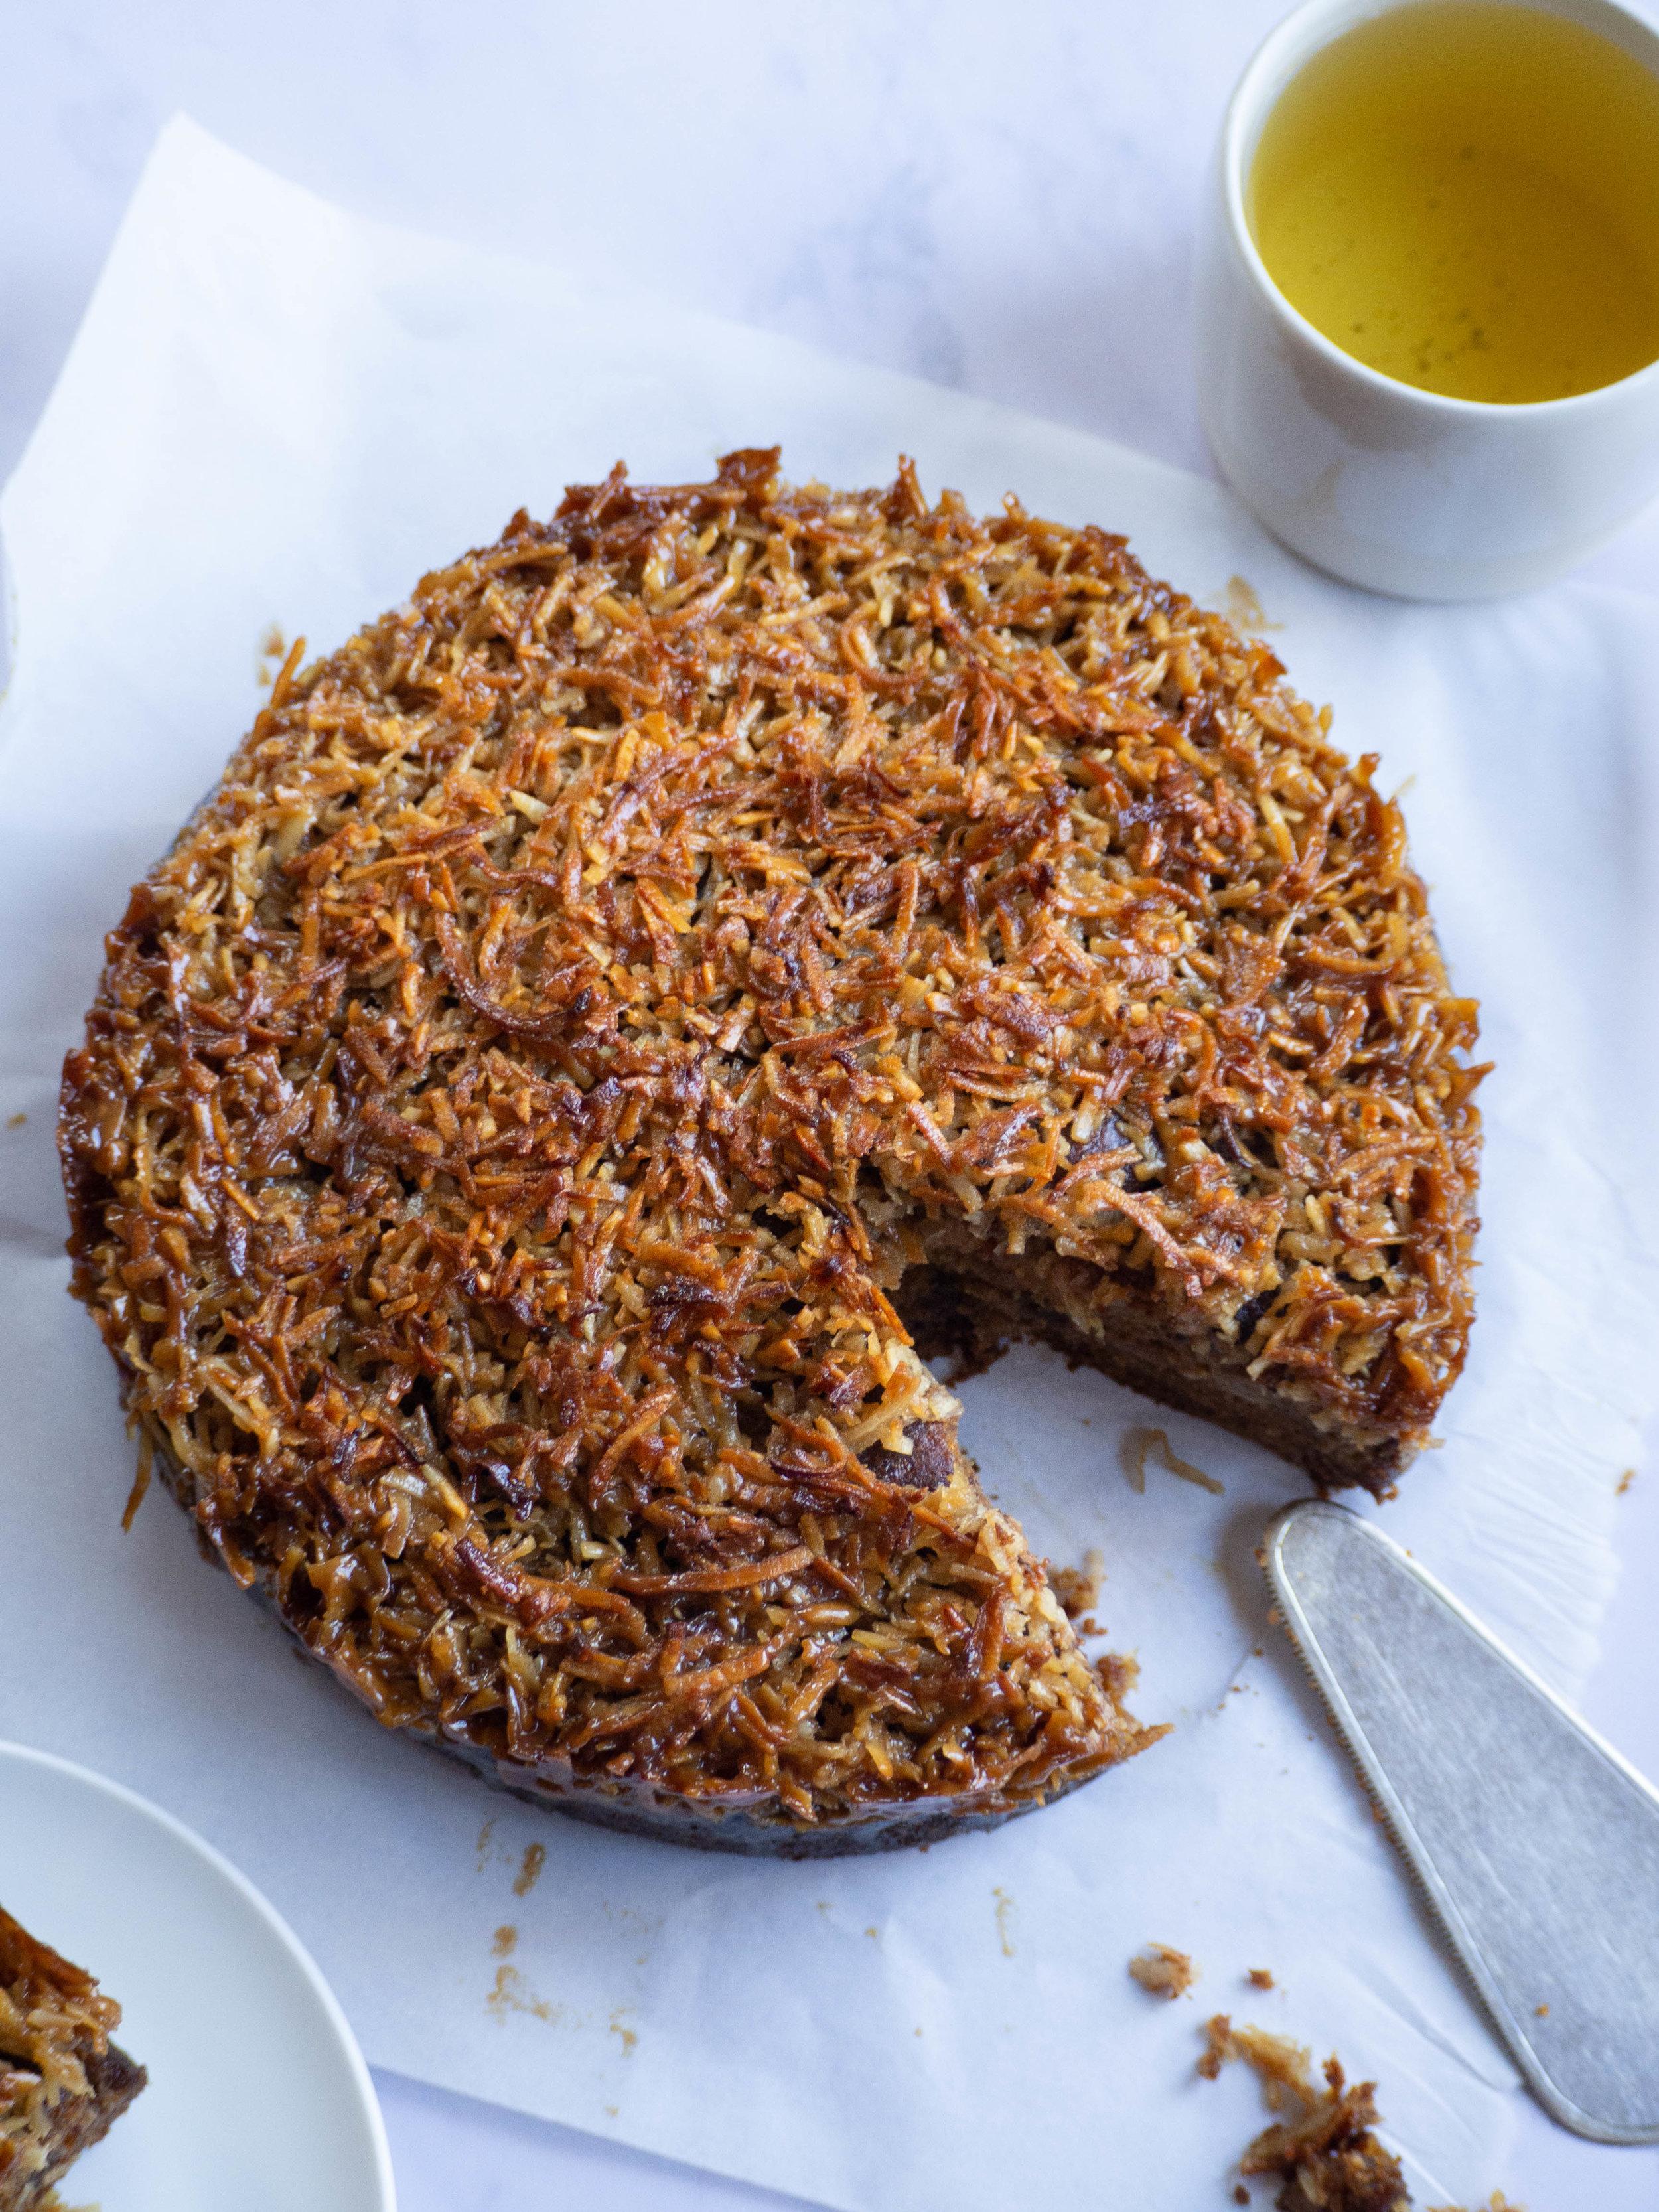 Lumberjack Cake (aka Queen Elizabeth Cake)